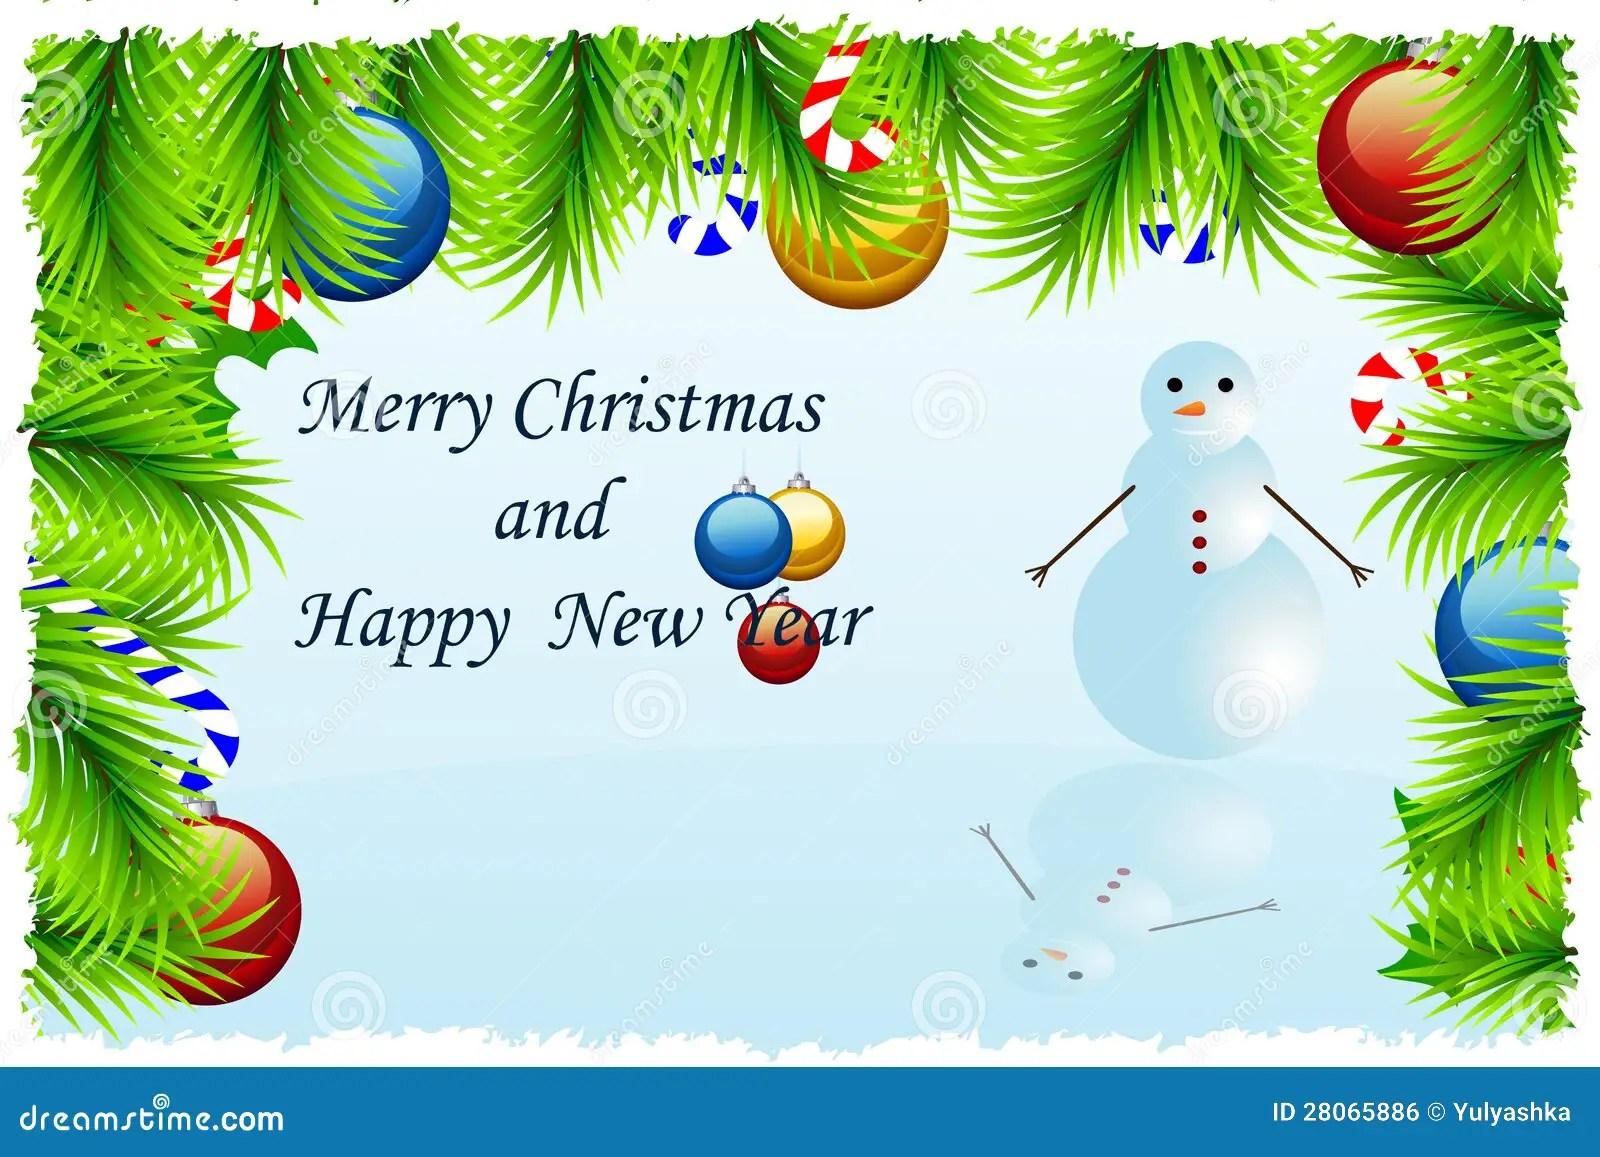 Template Christmas Greeting Card Stock Vector